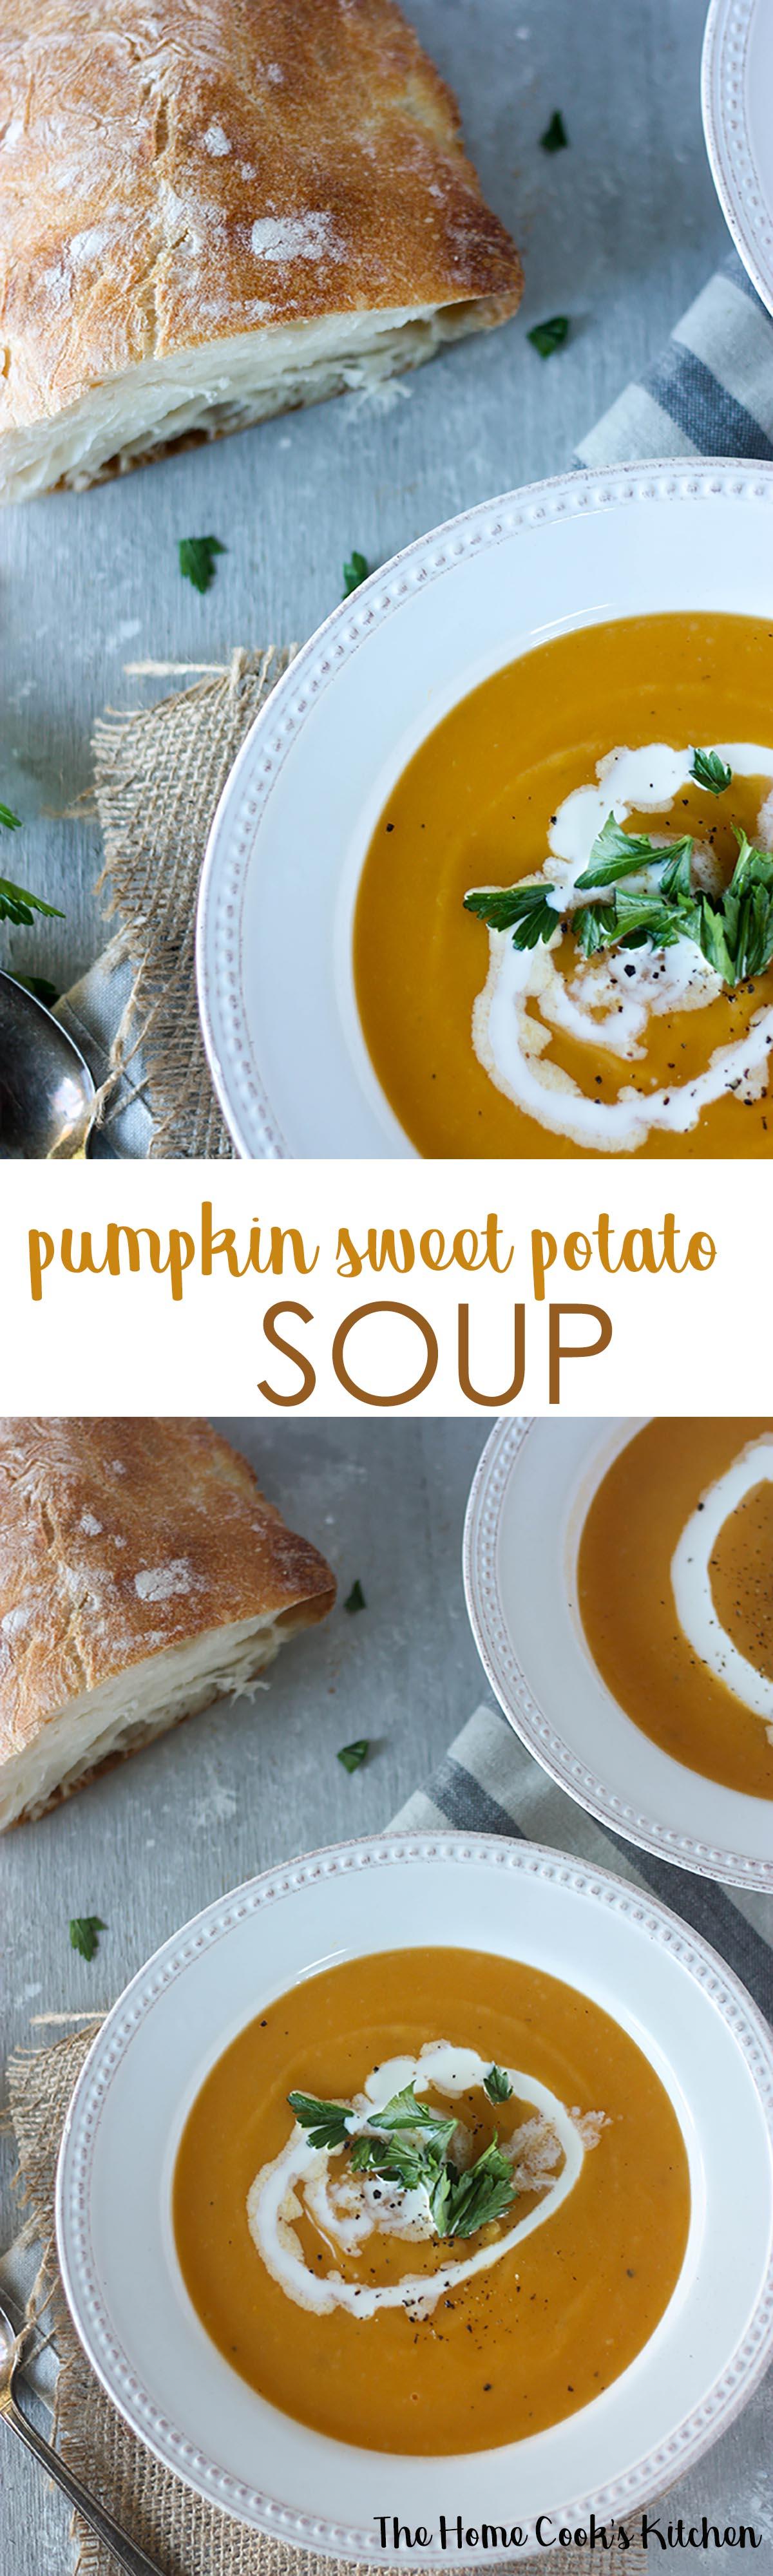 Pumpkin Sweet Potato Soup - a cozy recipe, easy and quick to make www.thehomecookskitchen.com